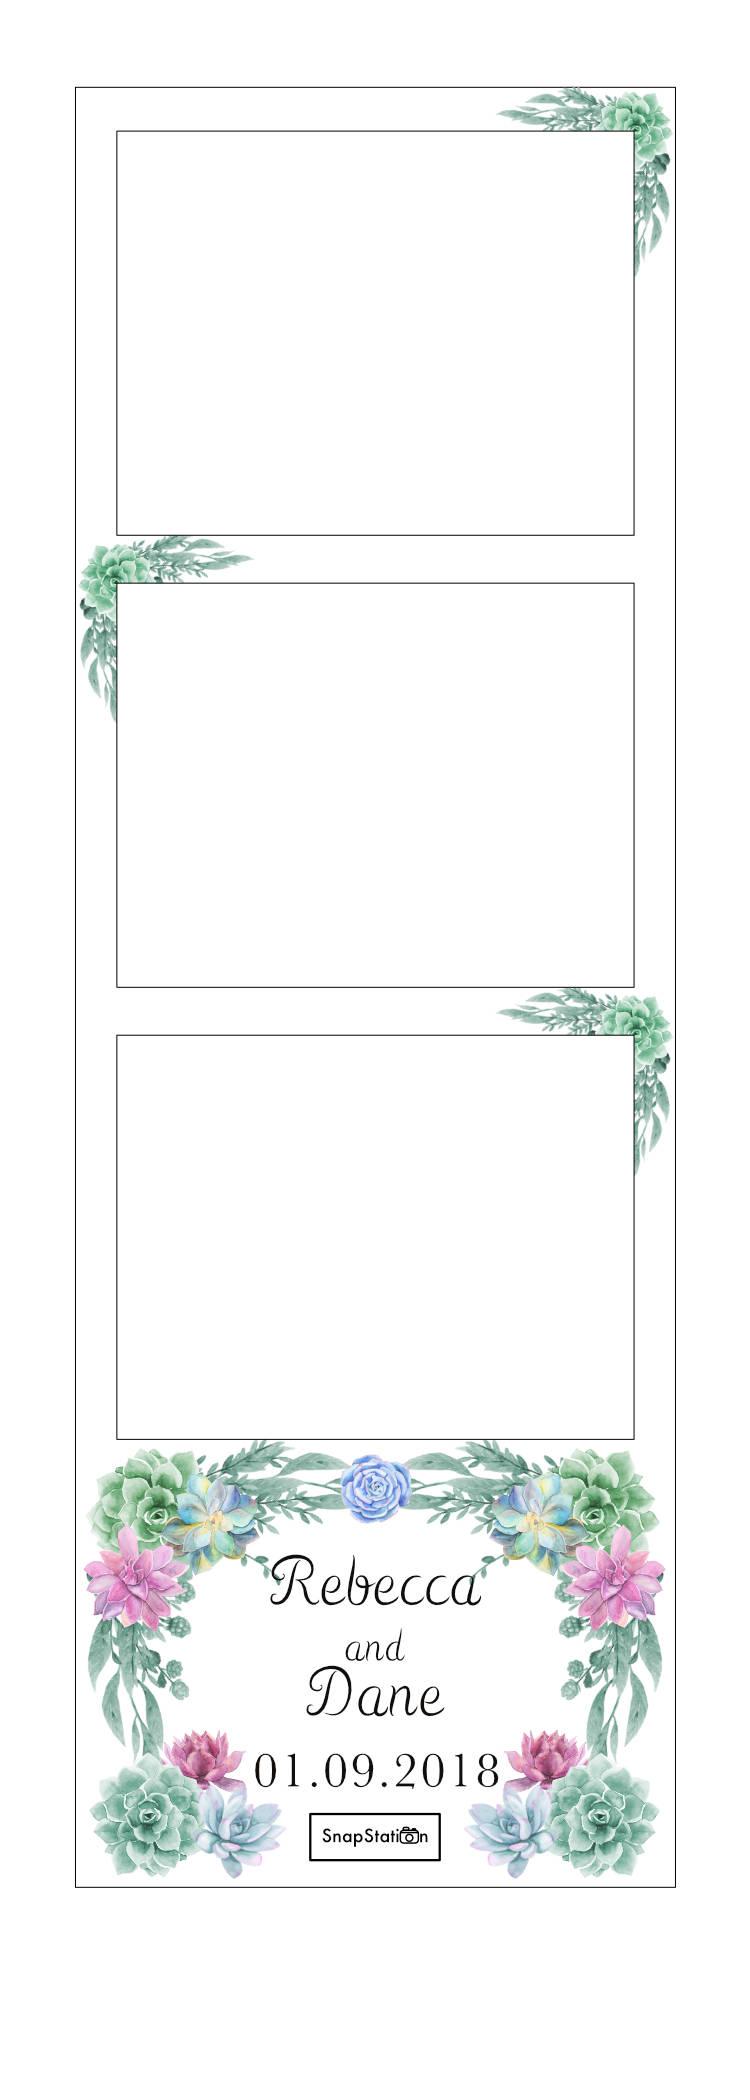 SnapStation Photo Booth Photo Strip - Succulent.jpg